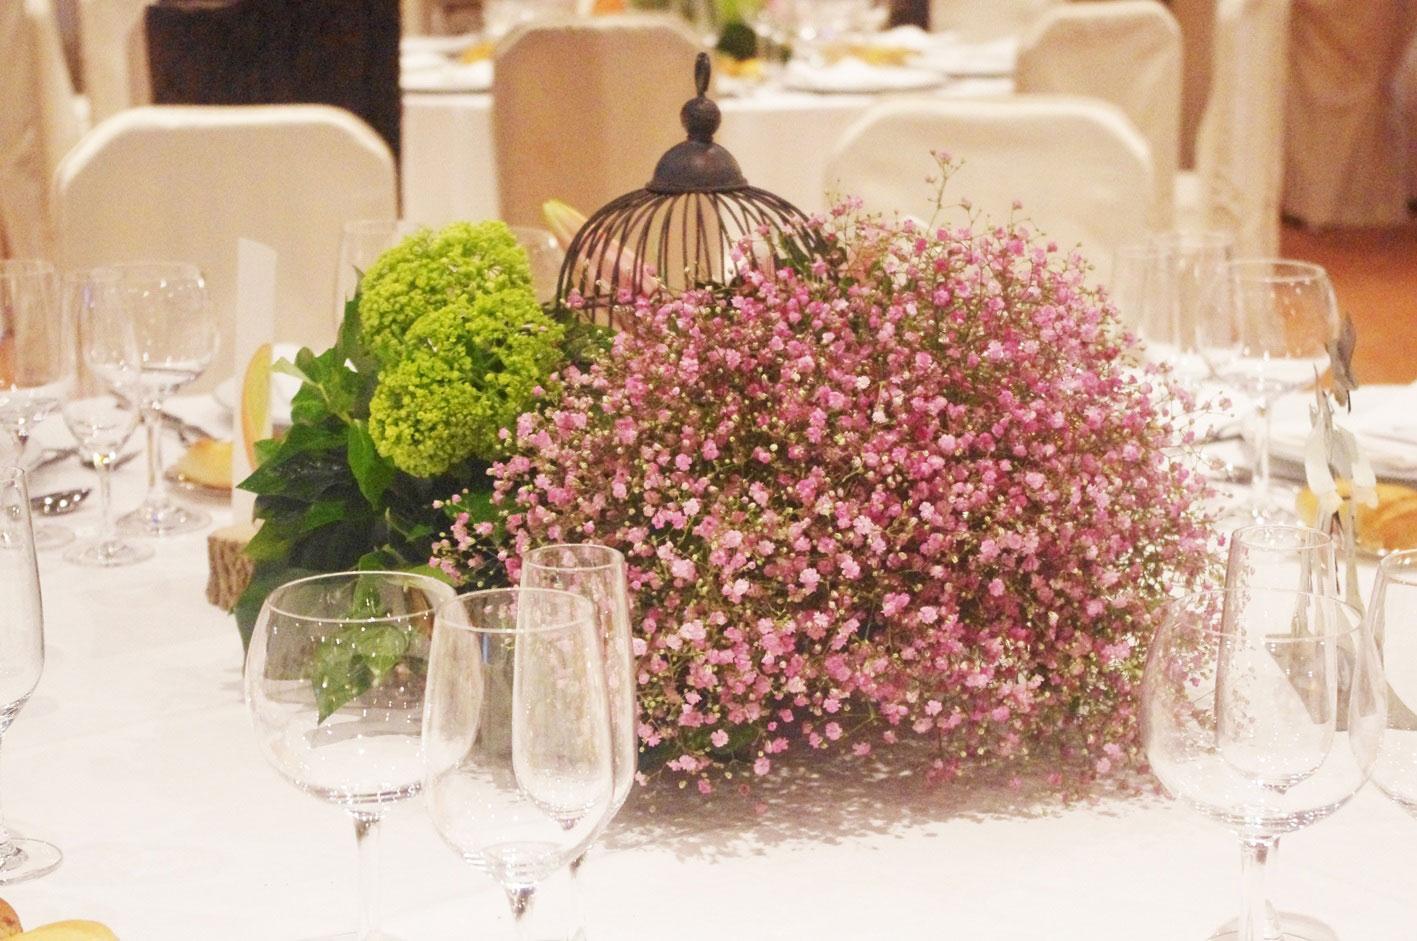 Fiore - Flowers Bilbao